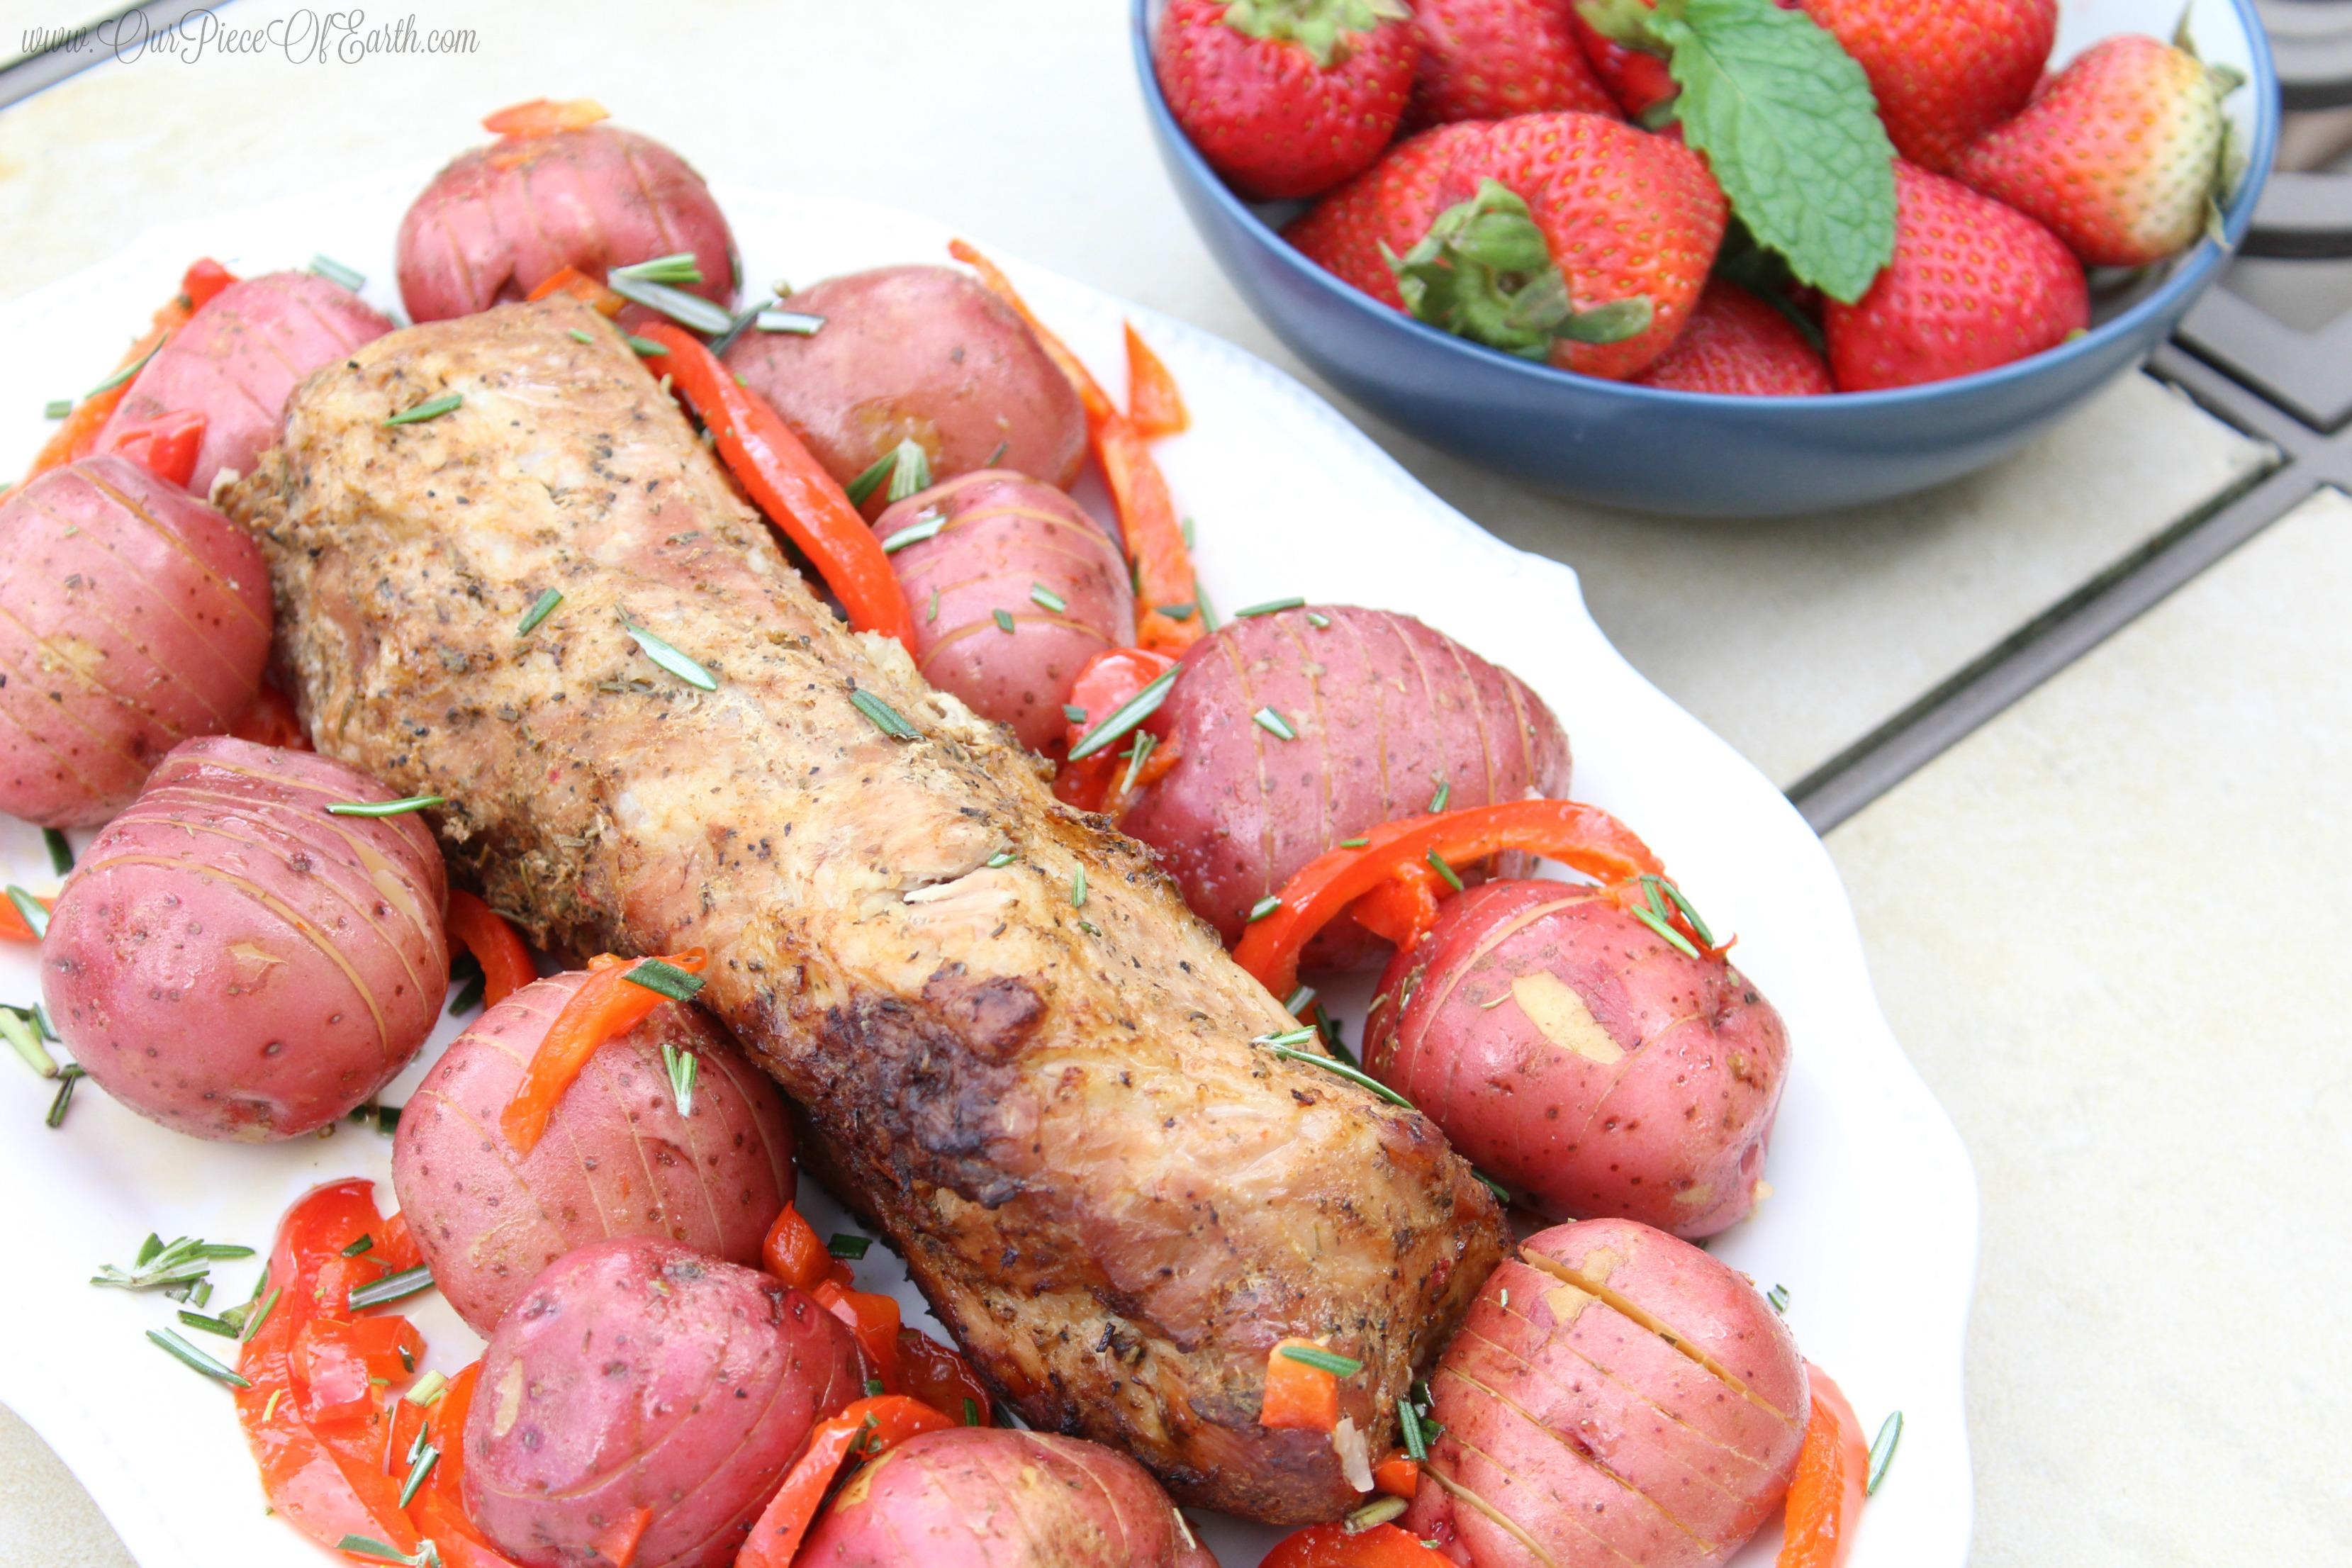 Smithfield Marinated Fresh Pork w potatoes and strawberries